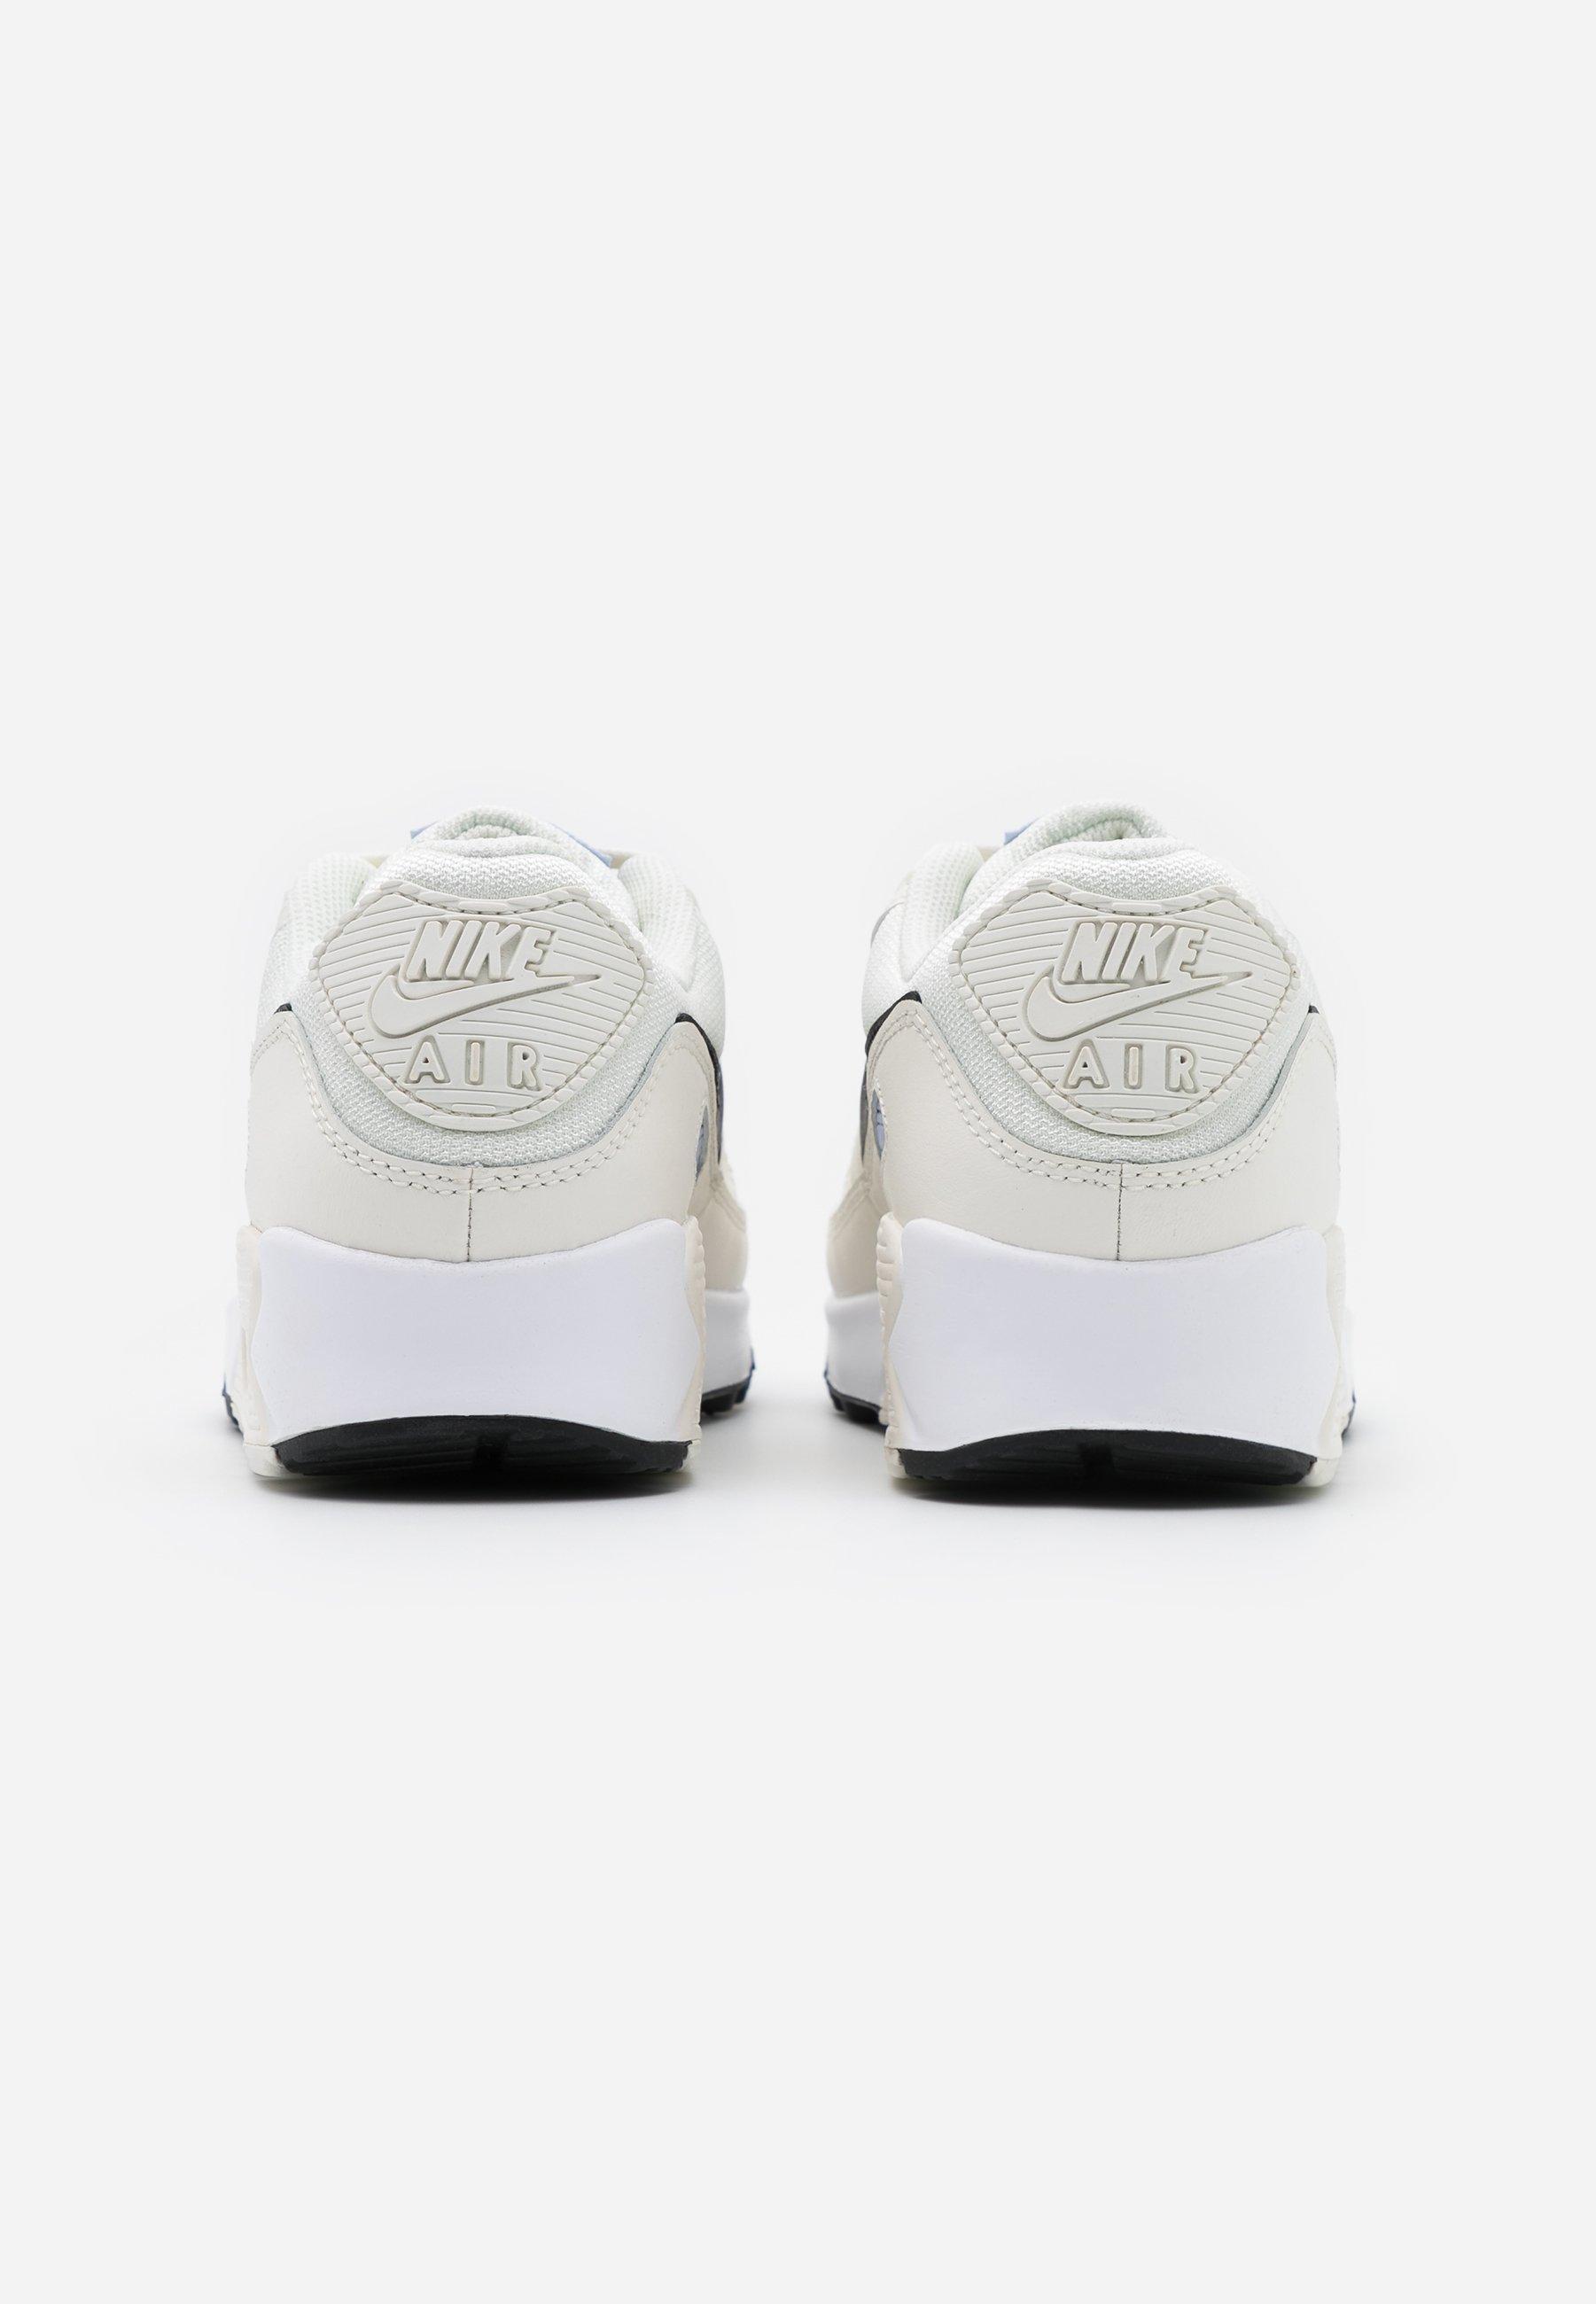 Grande remise Meilleurs prix Nike Sportswear AIR MAX 90 Baskets basses sail/black/ghost rqbUJ